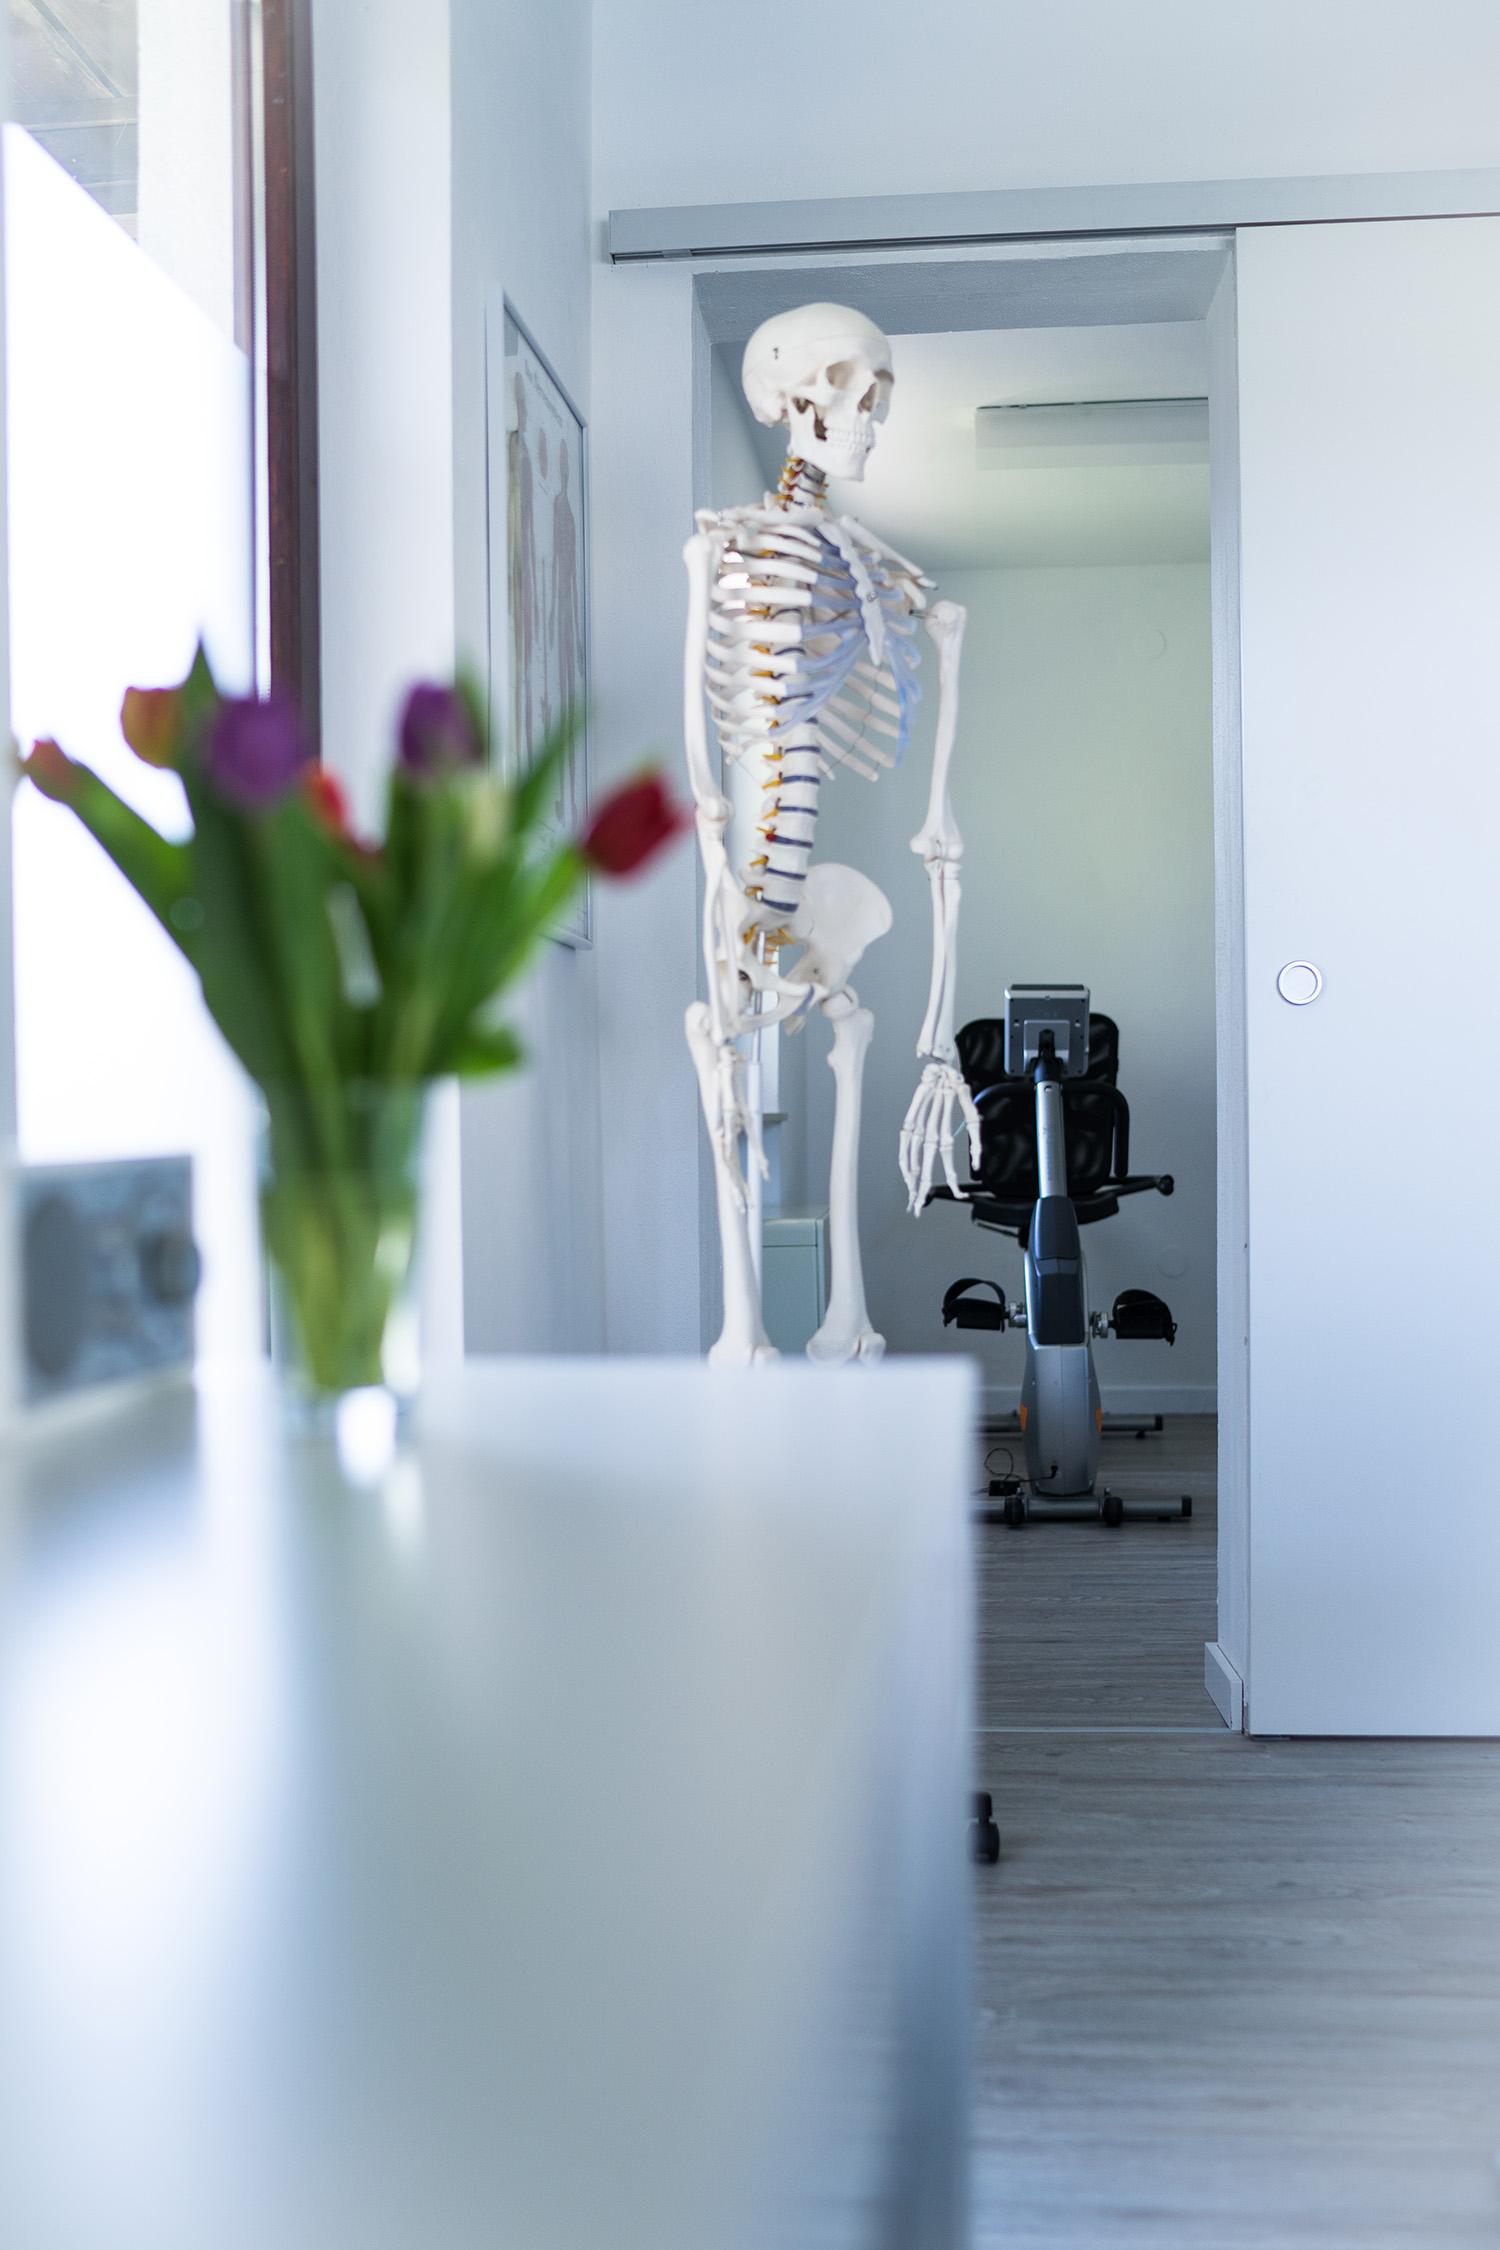 physiotherapie barbara klinger in perwang am see physiotherapie klinger. Black Bedroom Furniture Sets. Home Design Ideas